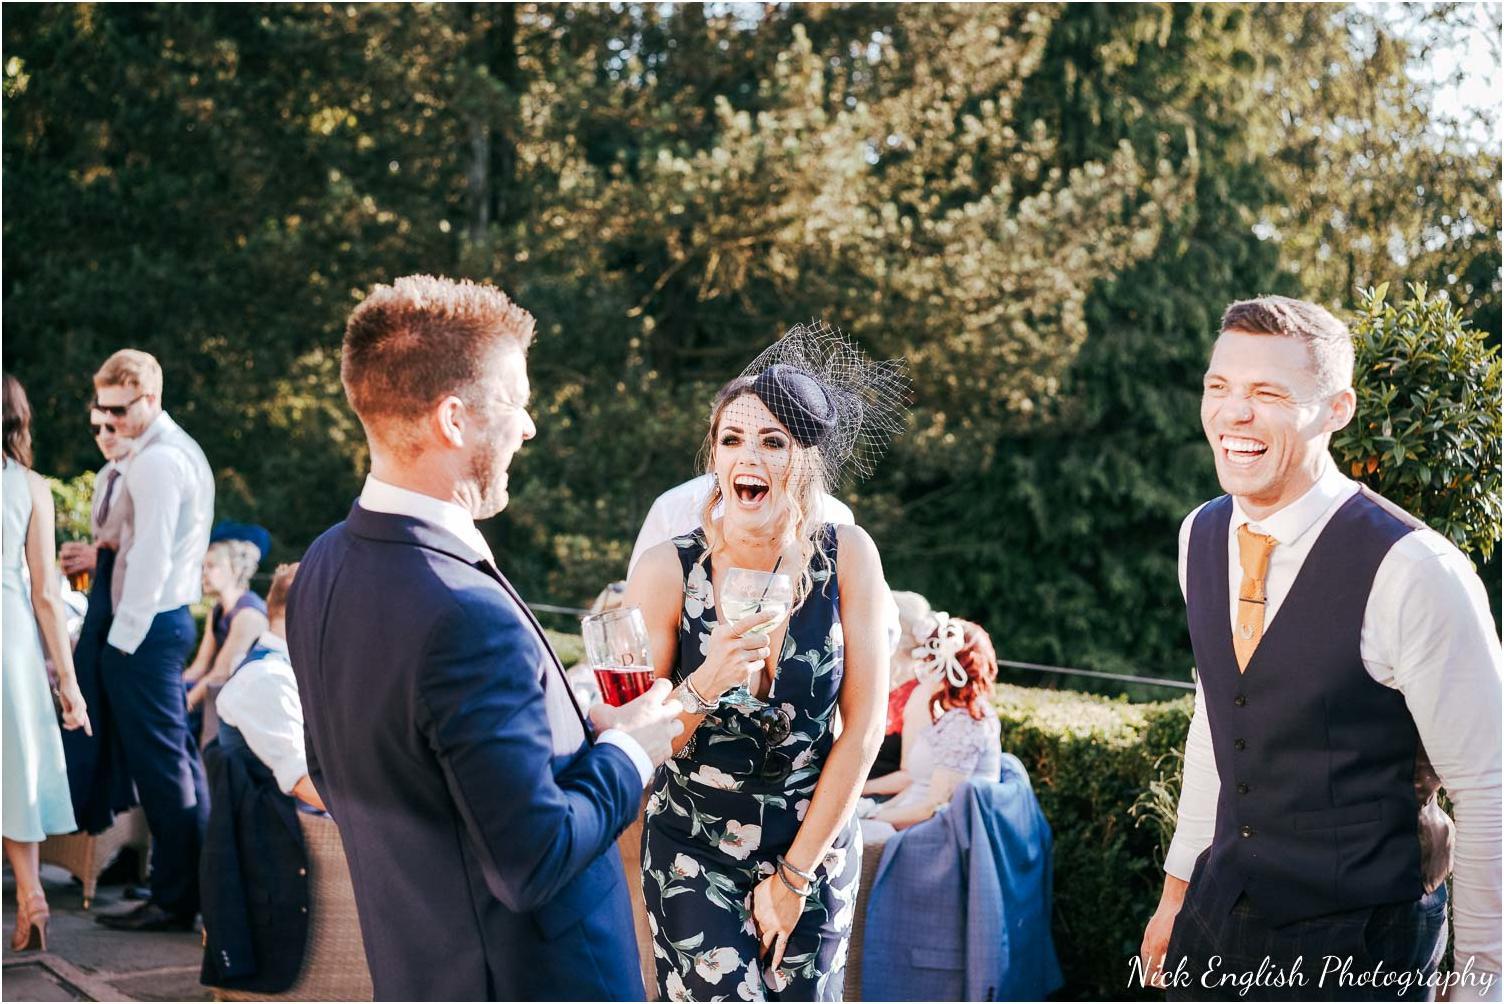 Mitton_Hall_Wedding_Photograph-169.jpg